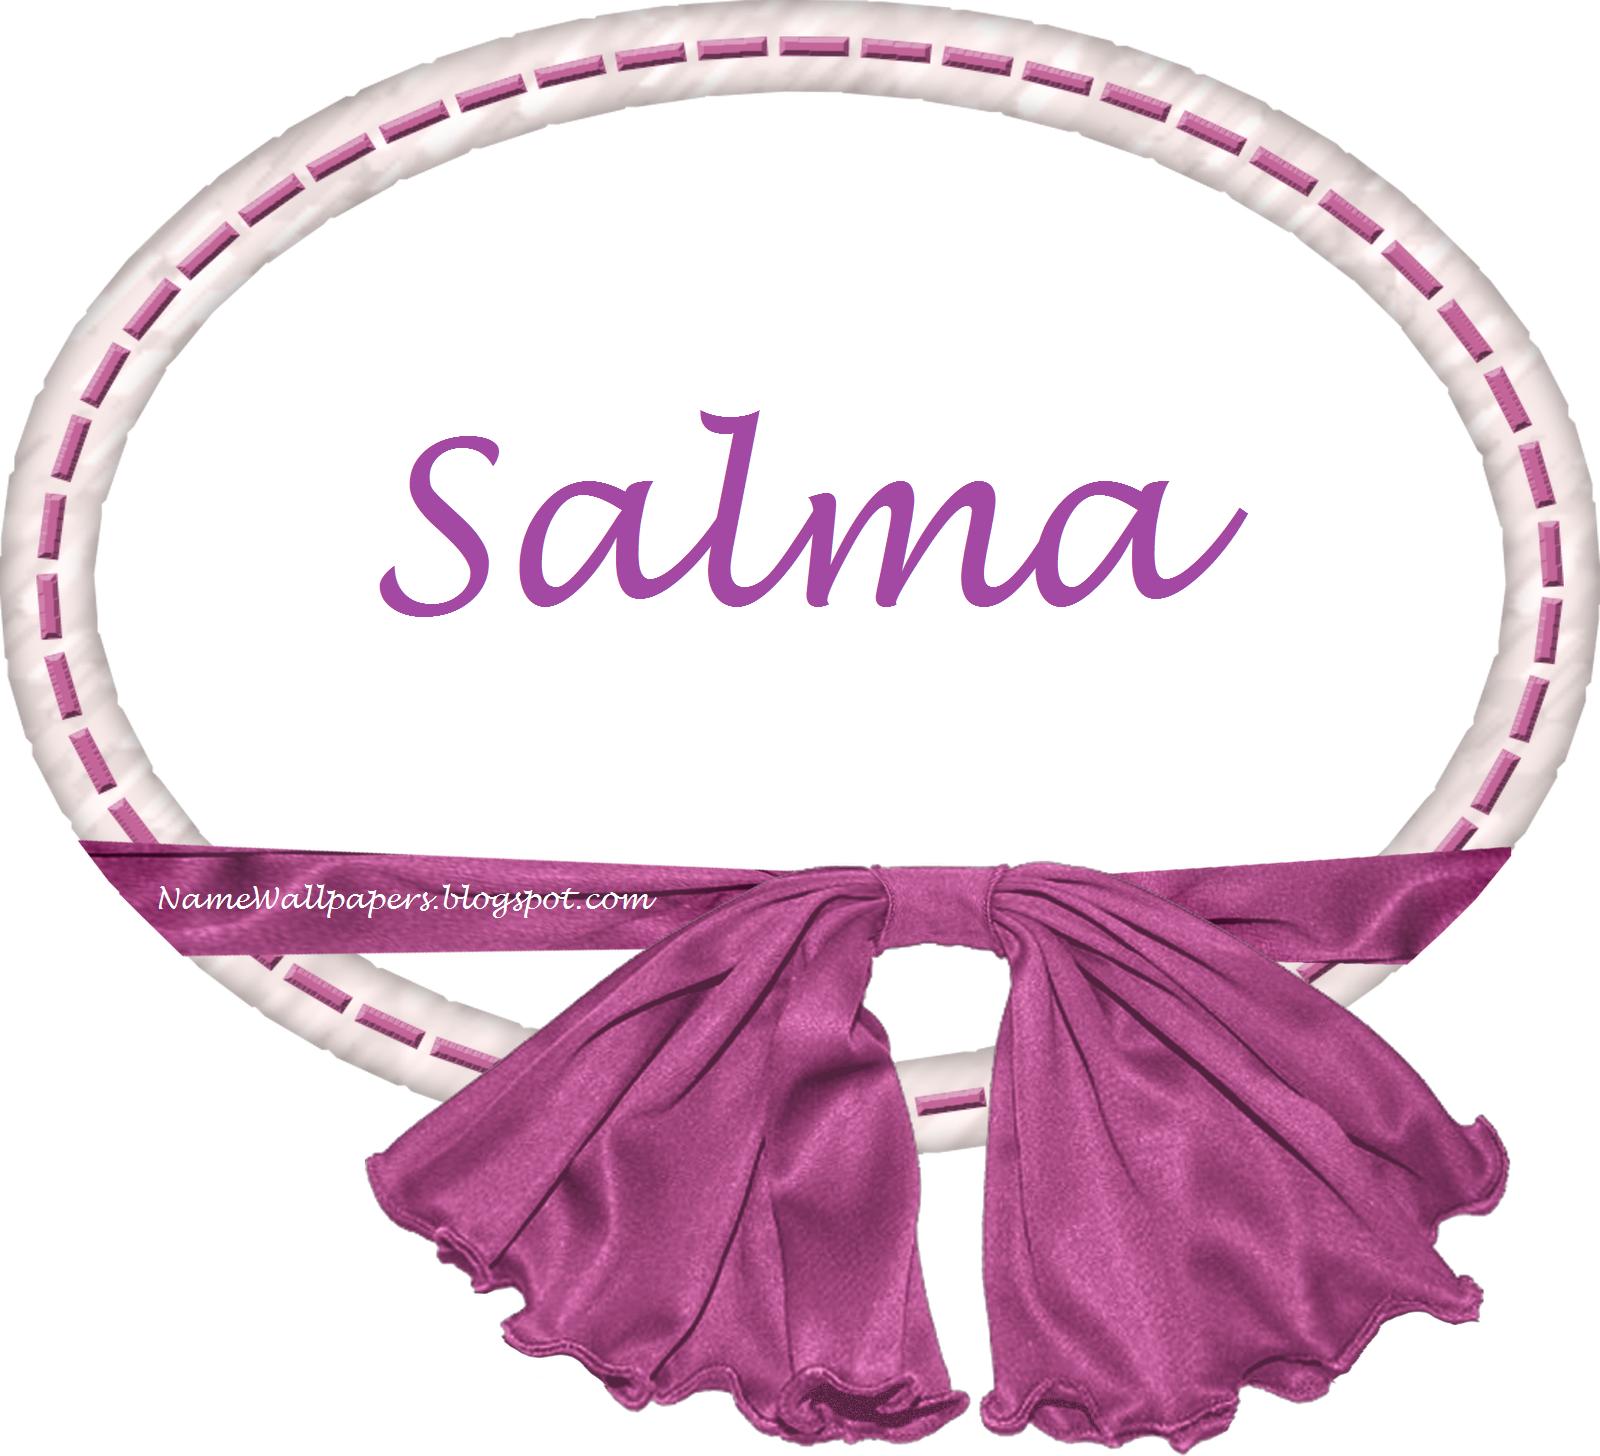 Download Wallpaper Name Maryam - salma%2Bpicture  HD_10949.png